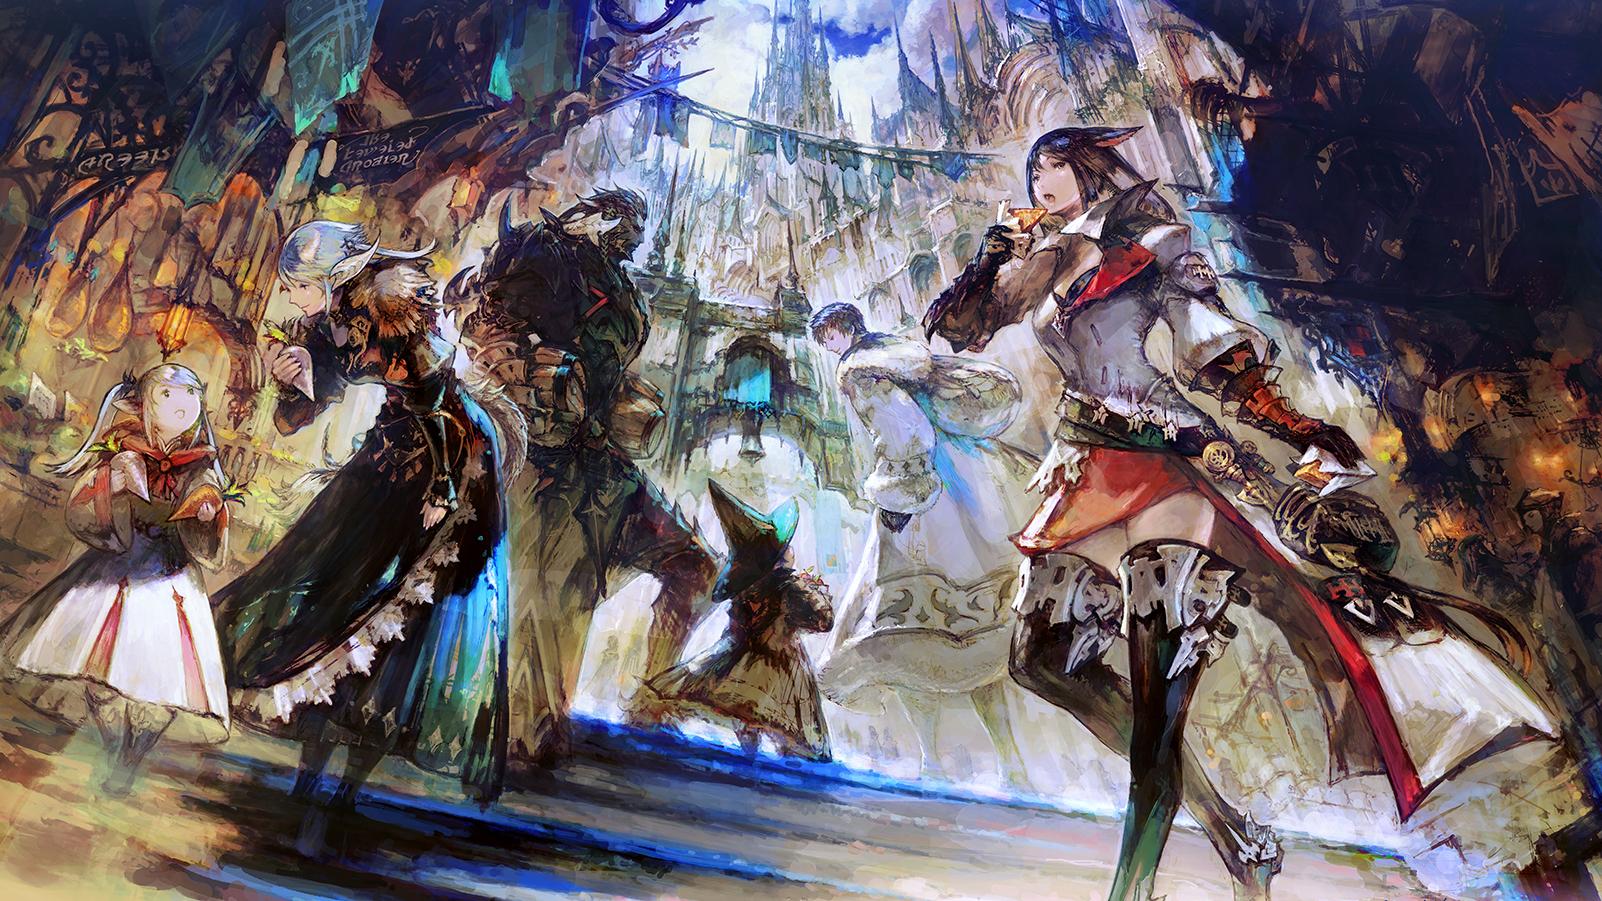 7 reasons Final Fantasy 14: Heavensward is a truly epic MMO